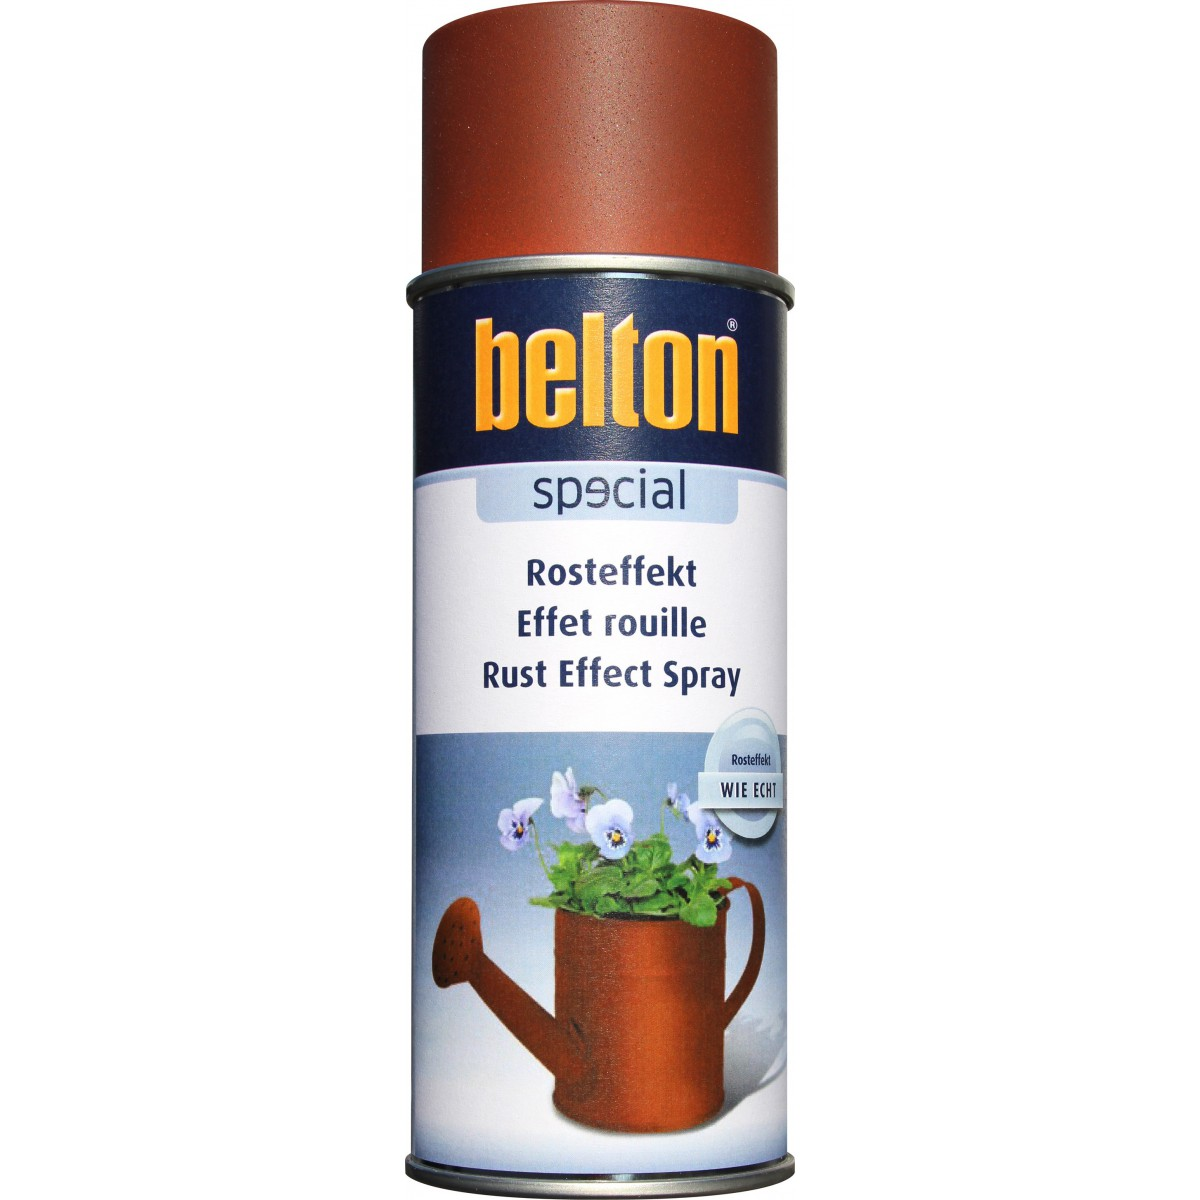 belton peinture a rosol effet rouille 400ml 7 71. Black Bedroom Furniture Sets. Home Design Ideas